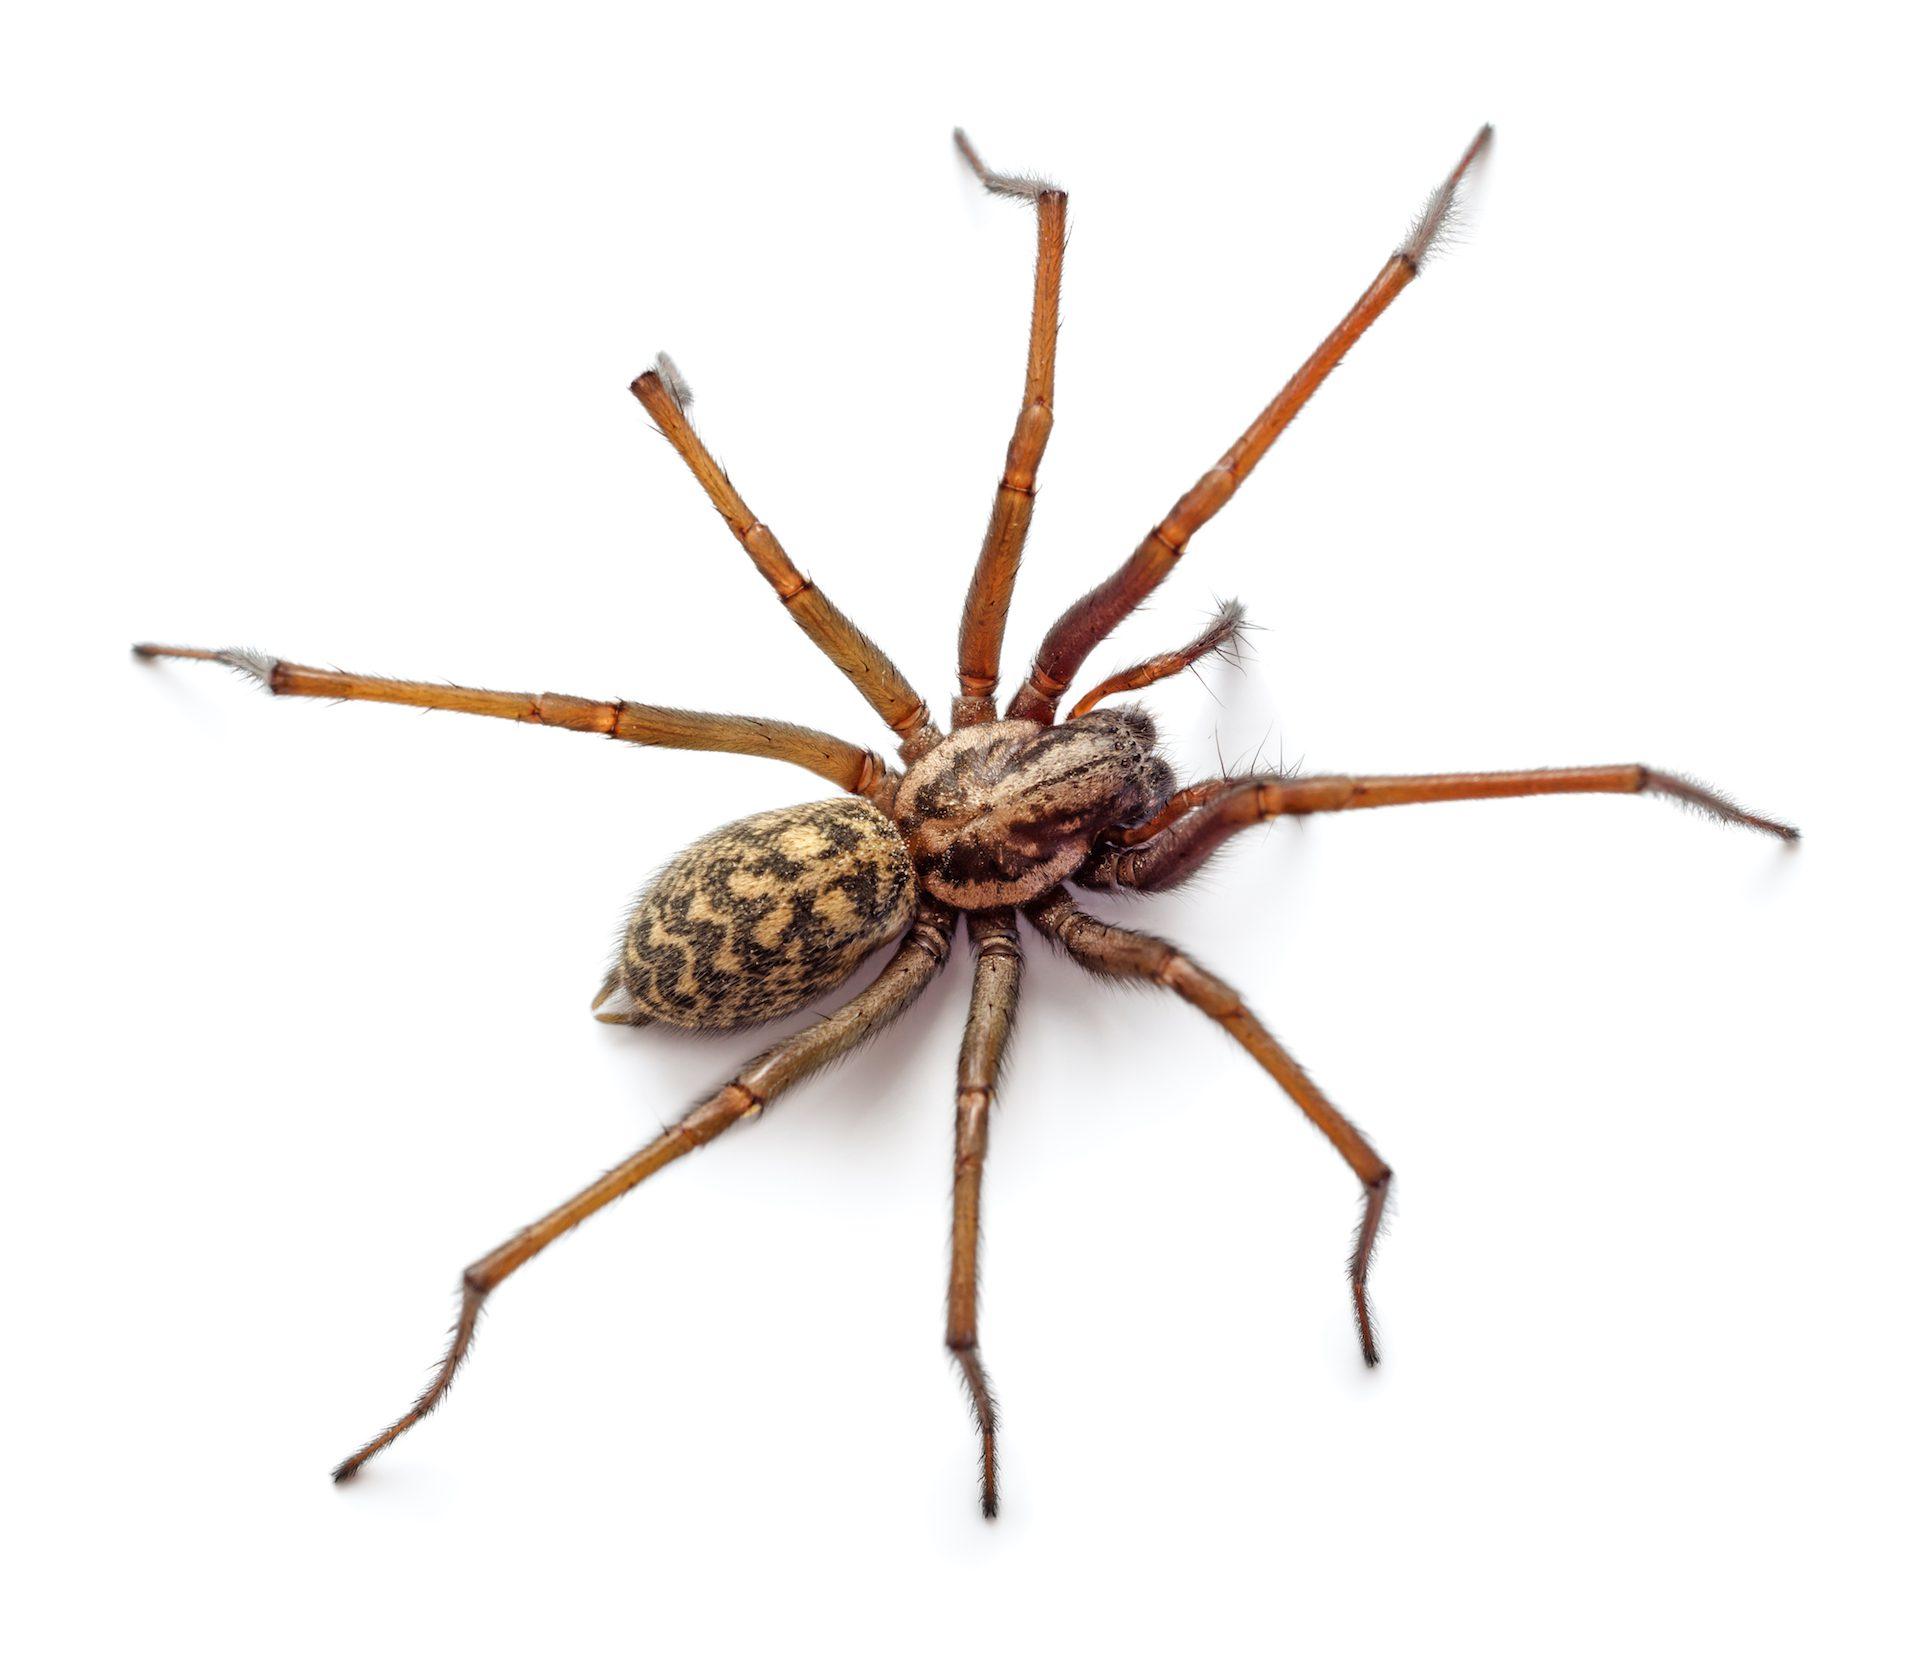 Big Spiders Control - Exterminator in Nashville - Preventative Pest Control - Certified Pest Control